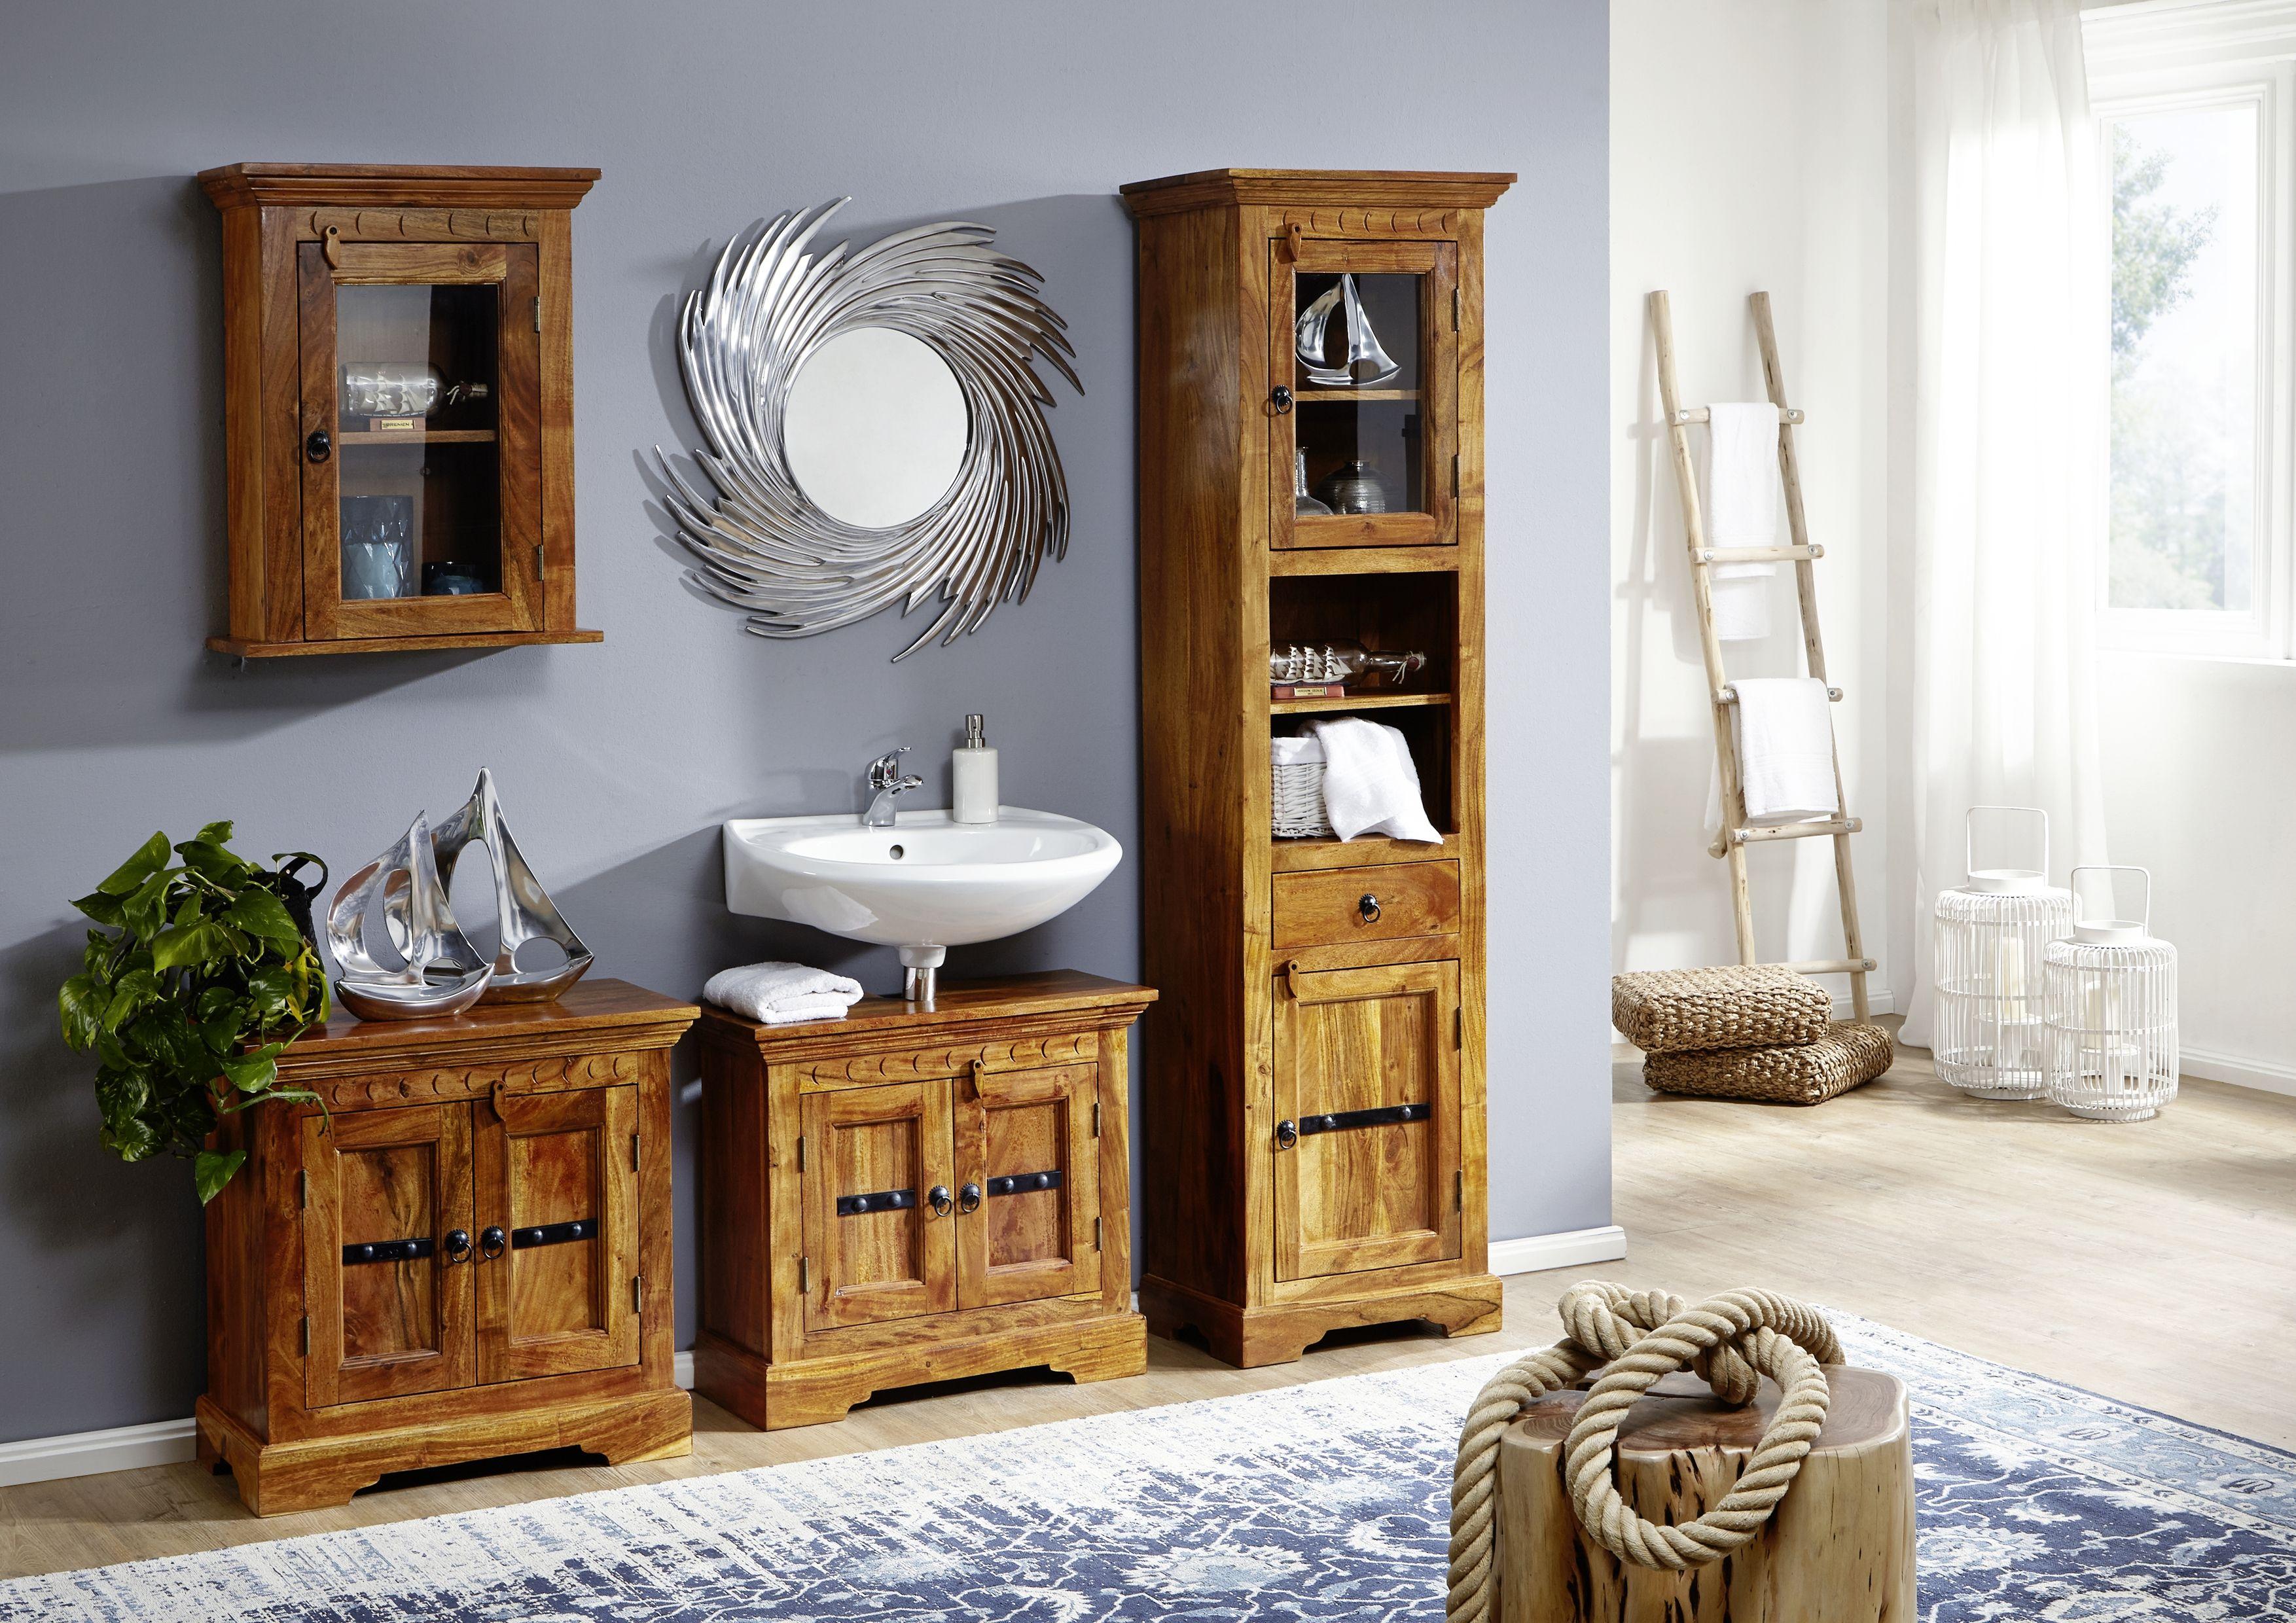 Badezimmer Kolonialstil badezimmer der oxford serie der kolonialstil vereint gekonnt